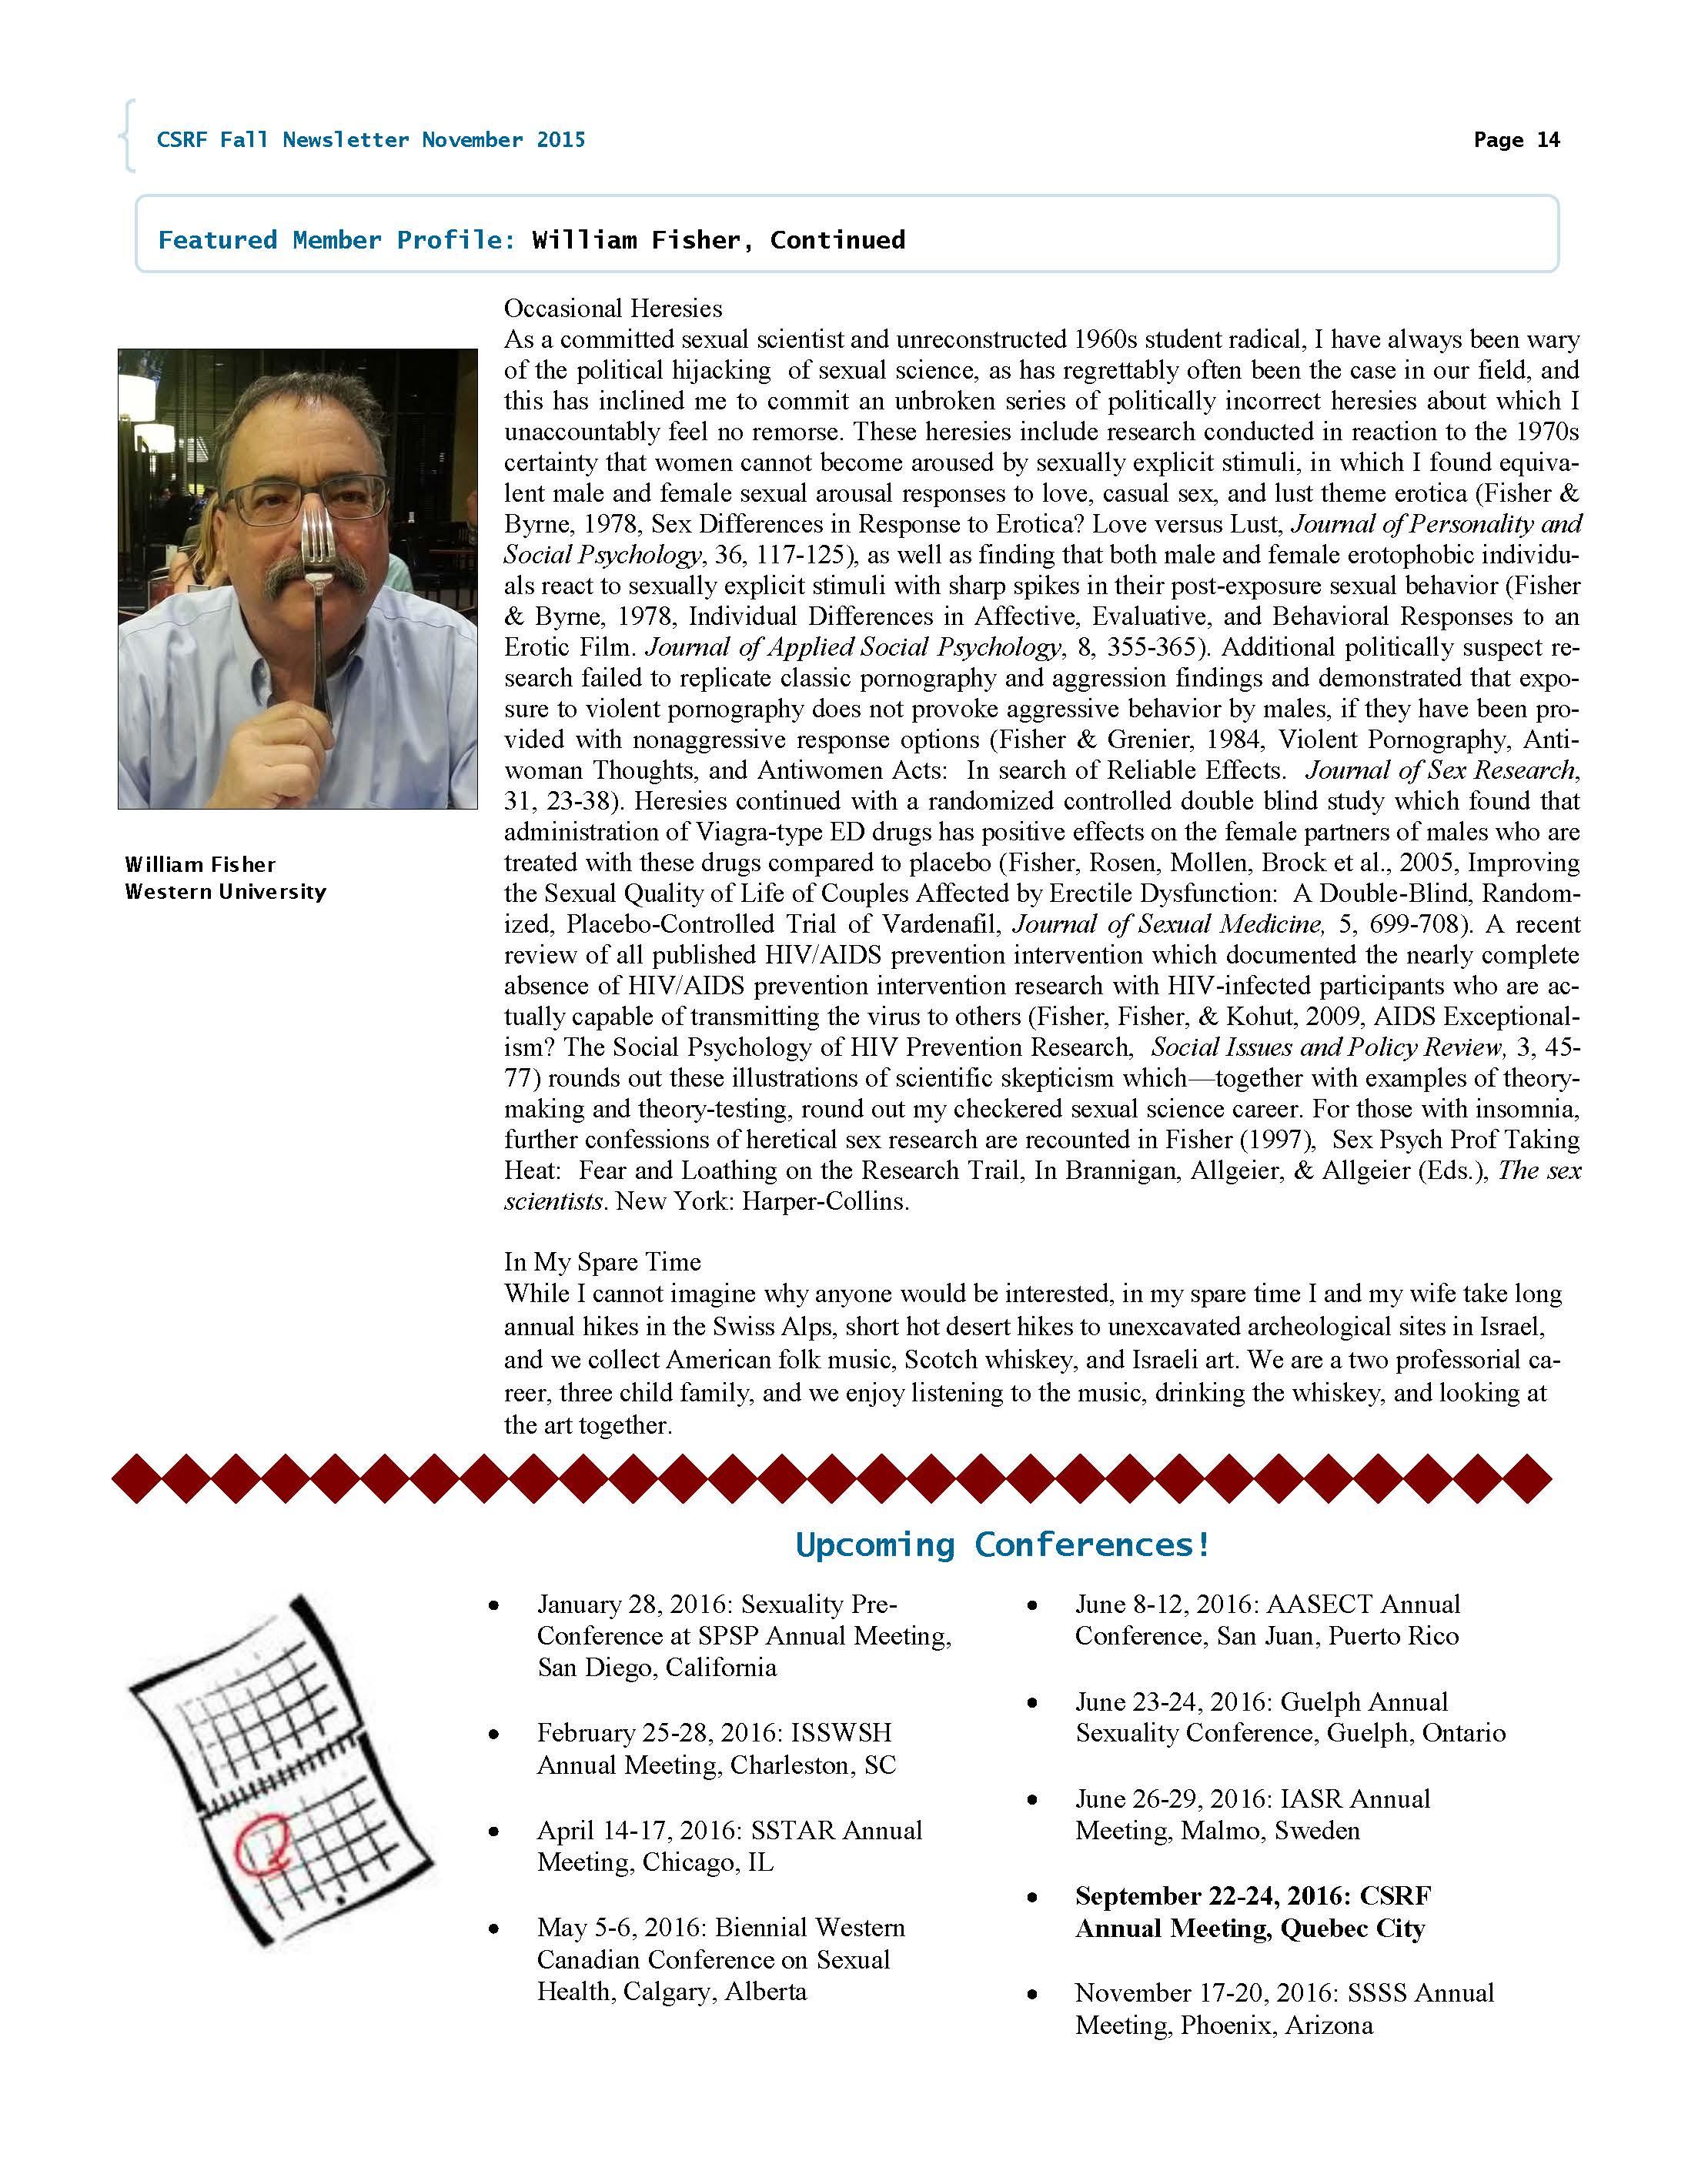 CSRF Fall Newsletter 2015_Page_14.jpg